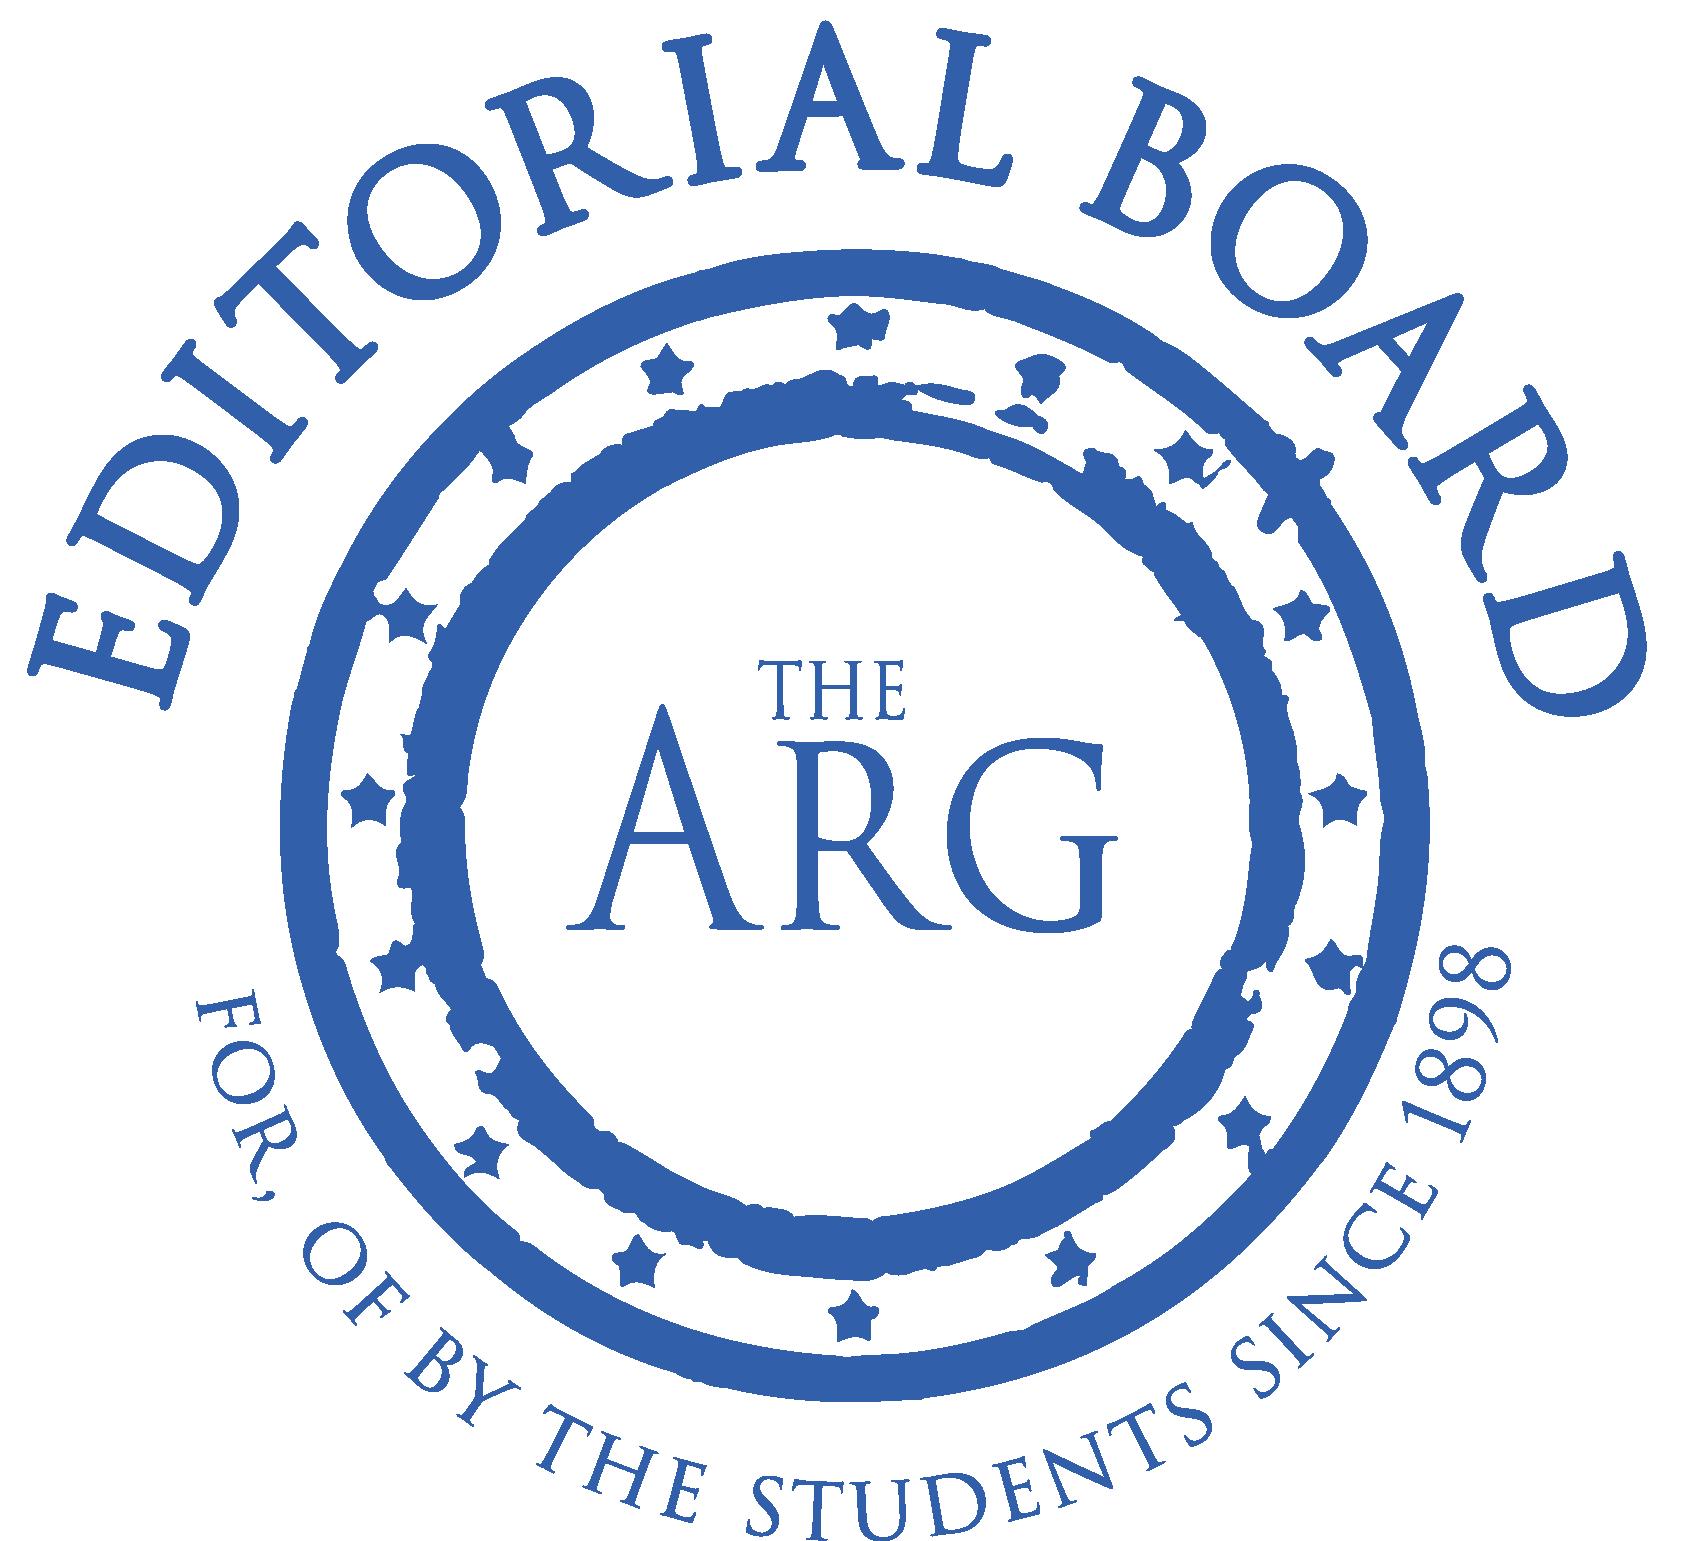 The Argonaut – We'll Getcha Next Time